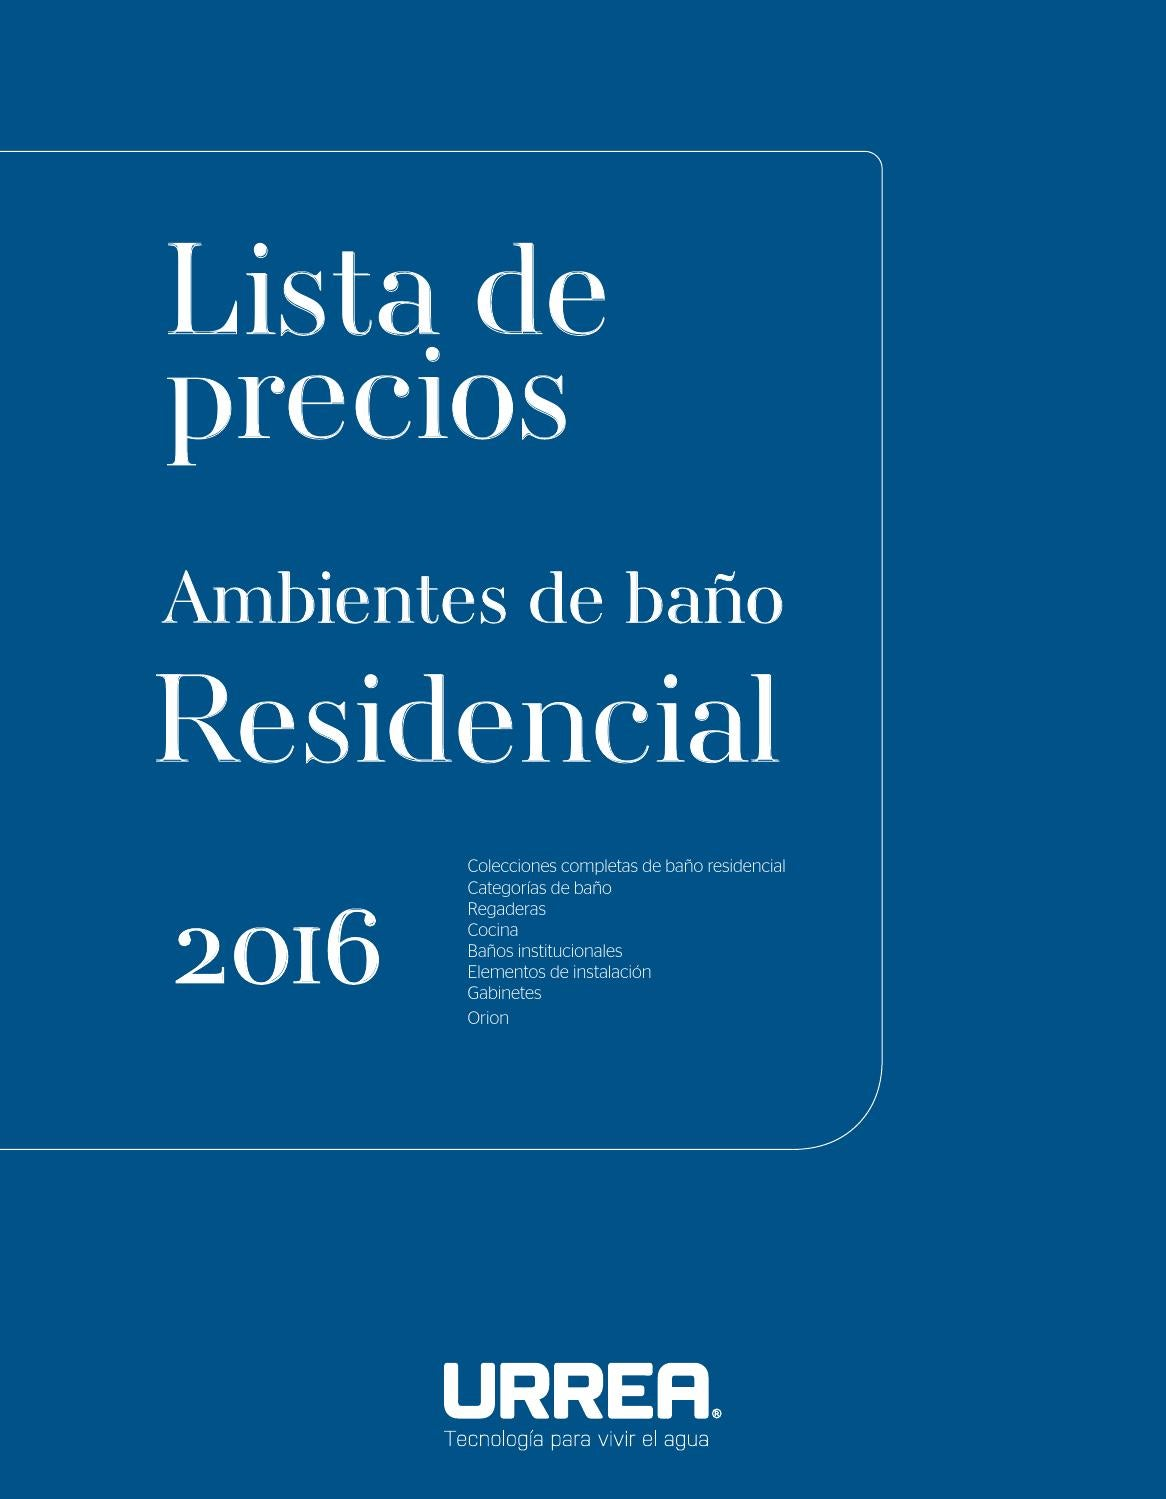 Lp urrea residencial 2016 by urrea m xico issuu for Lista utensilios para bano